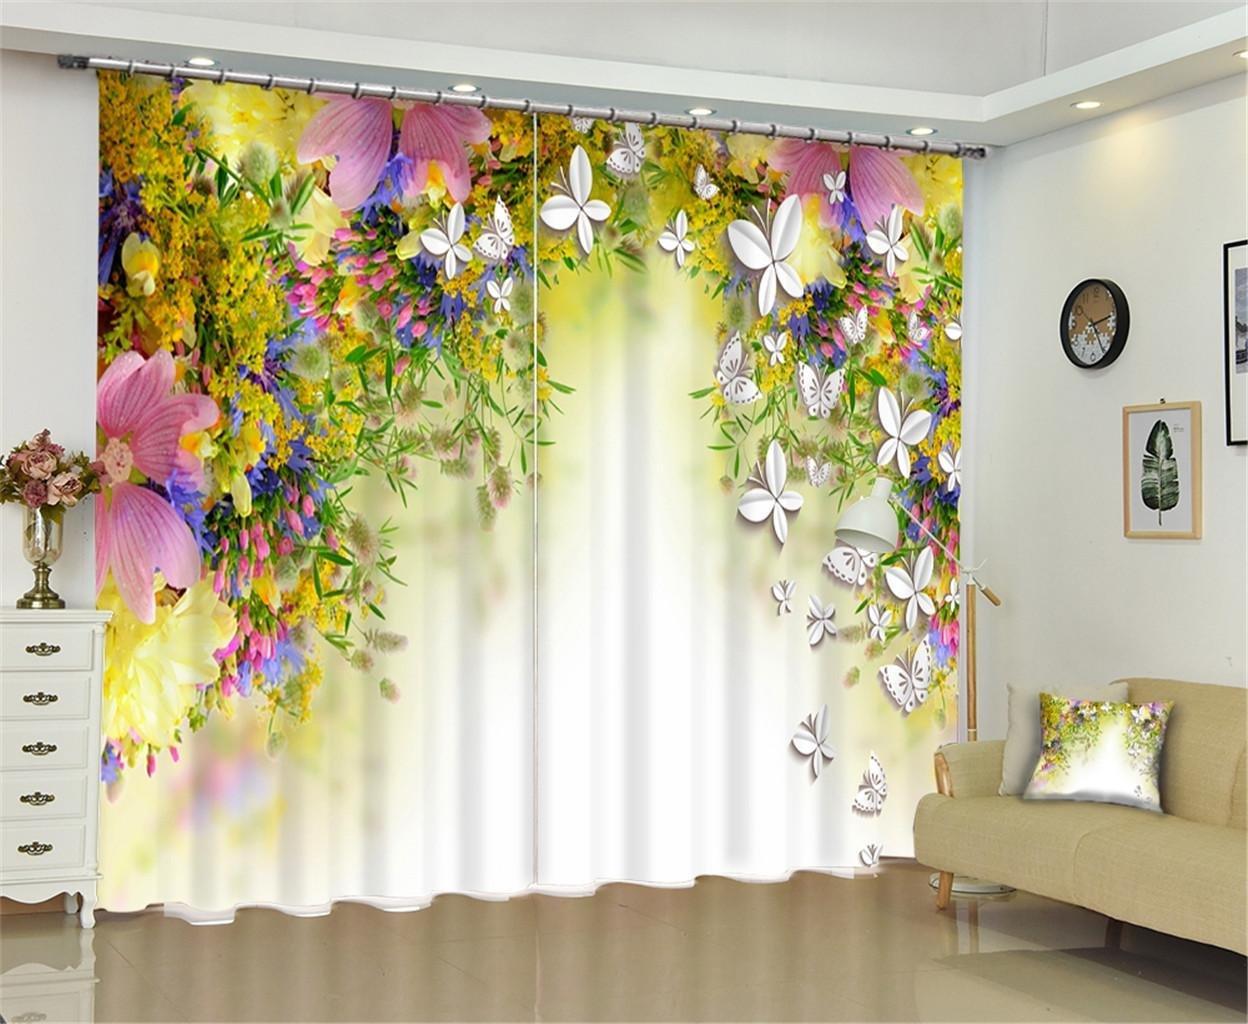 klddzq 100 %ポリエステル遮光カーテン、3d Floral Wildflowerデザインウィンドウブラインドブロックアウト90 % Sunlight /熱ブラックアウト、紫外線対策、防止ノイズ、輻射防止、寝室リビングルーム装飾 142*106 inch 98745123 142*106 inch  B0789XLF7L